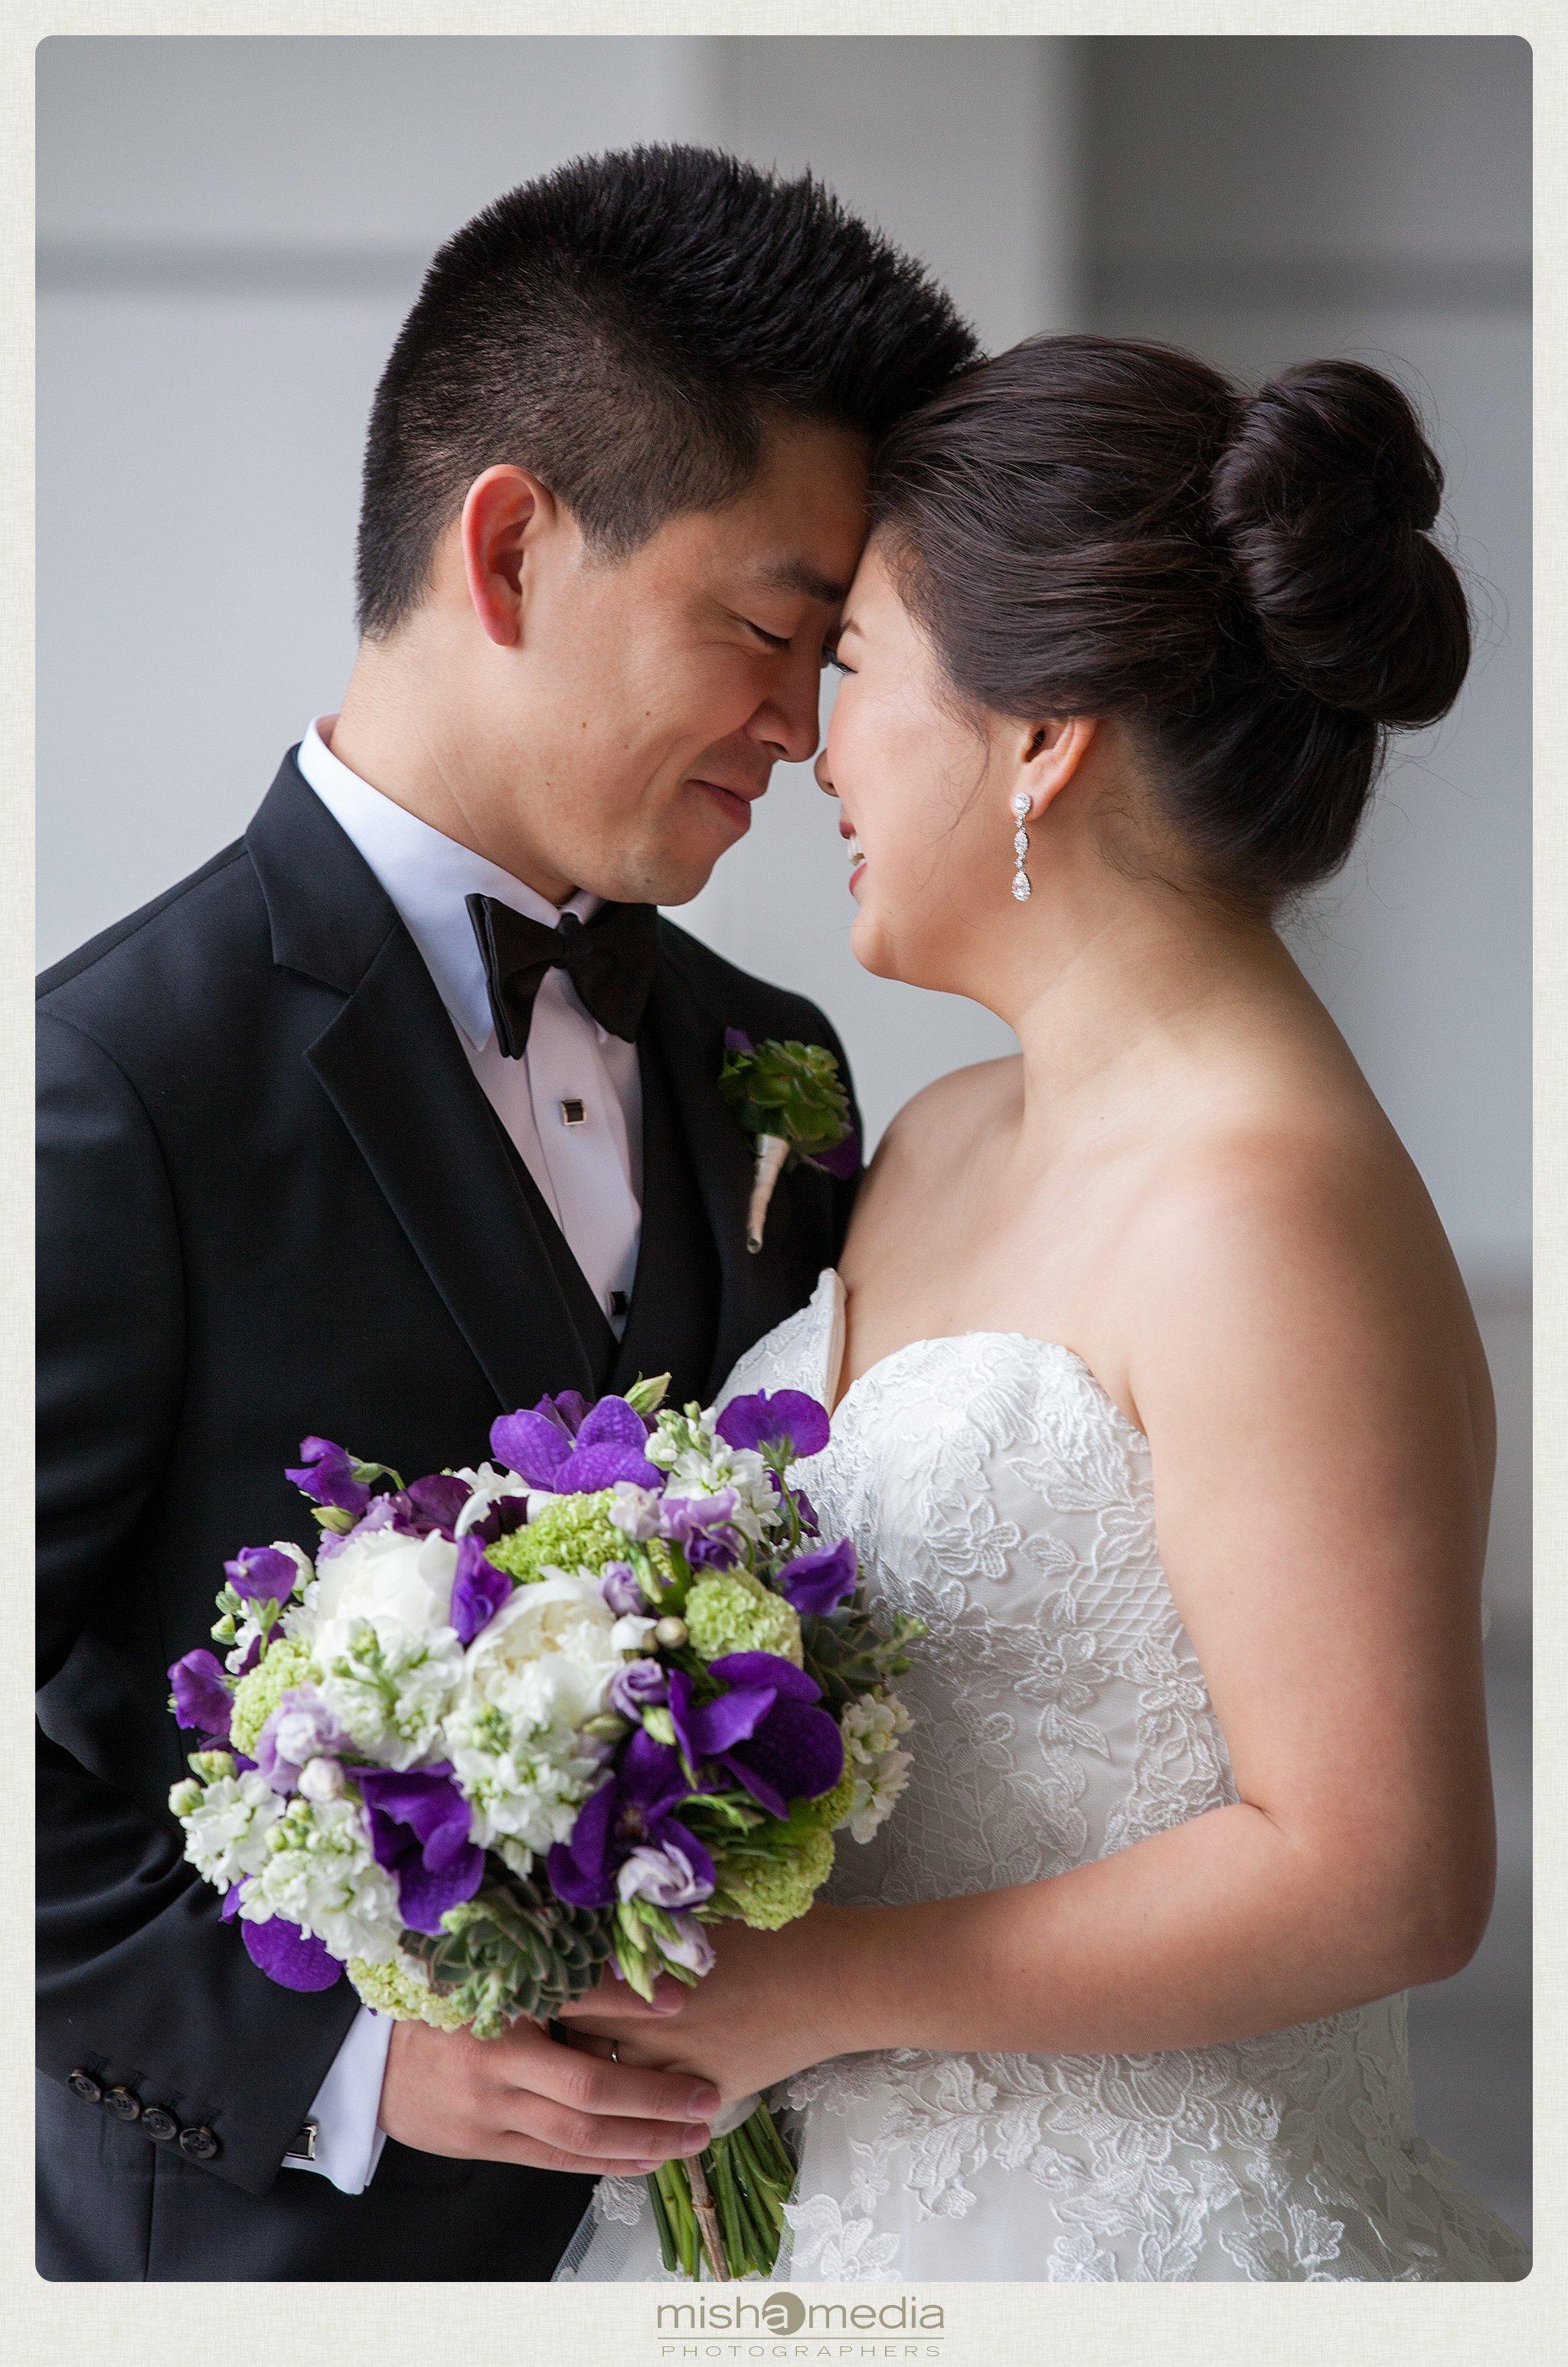 Weddings-at-Ignite-Glass-Studio_0001.jpg